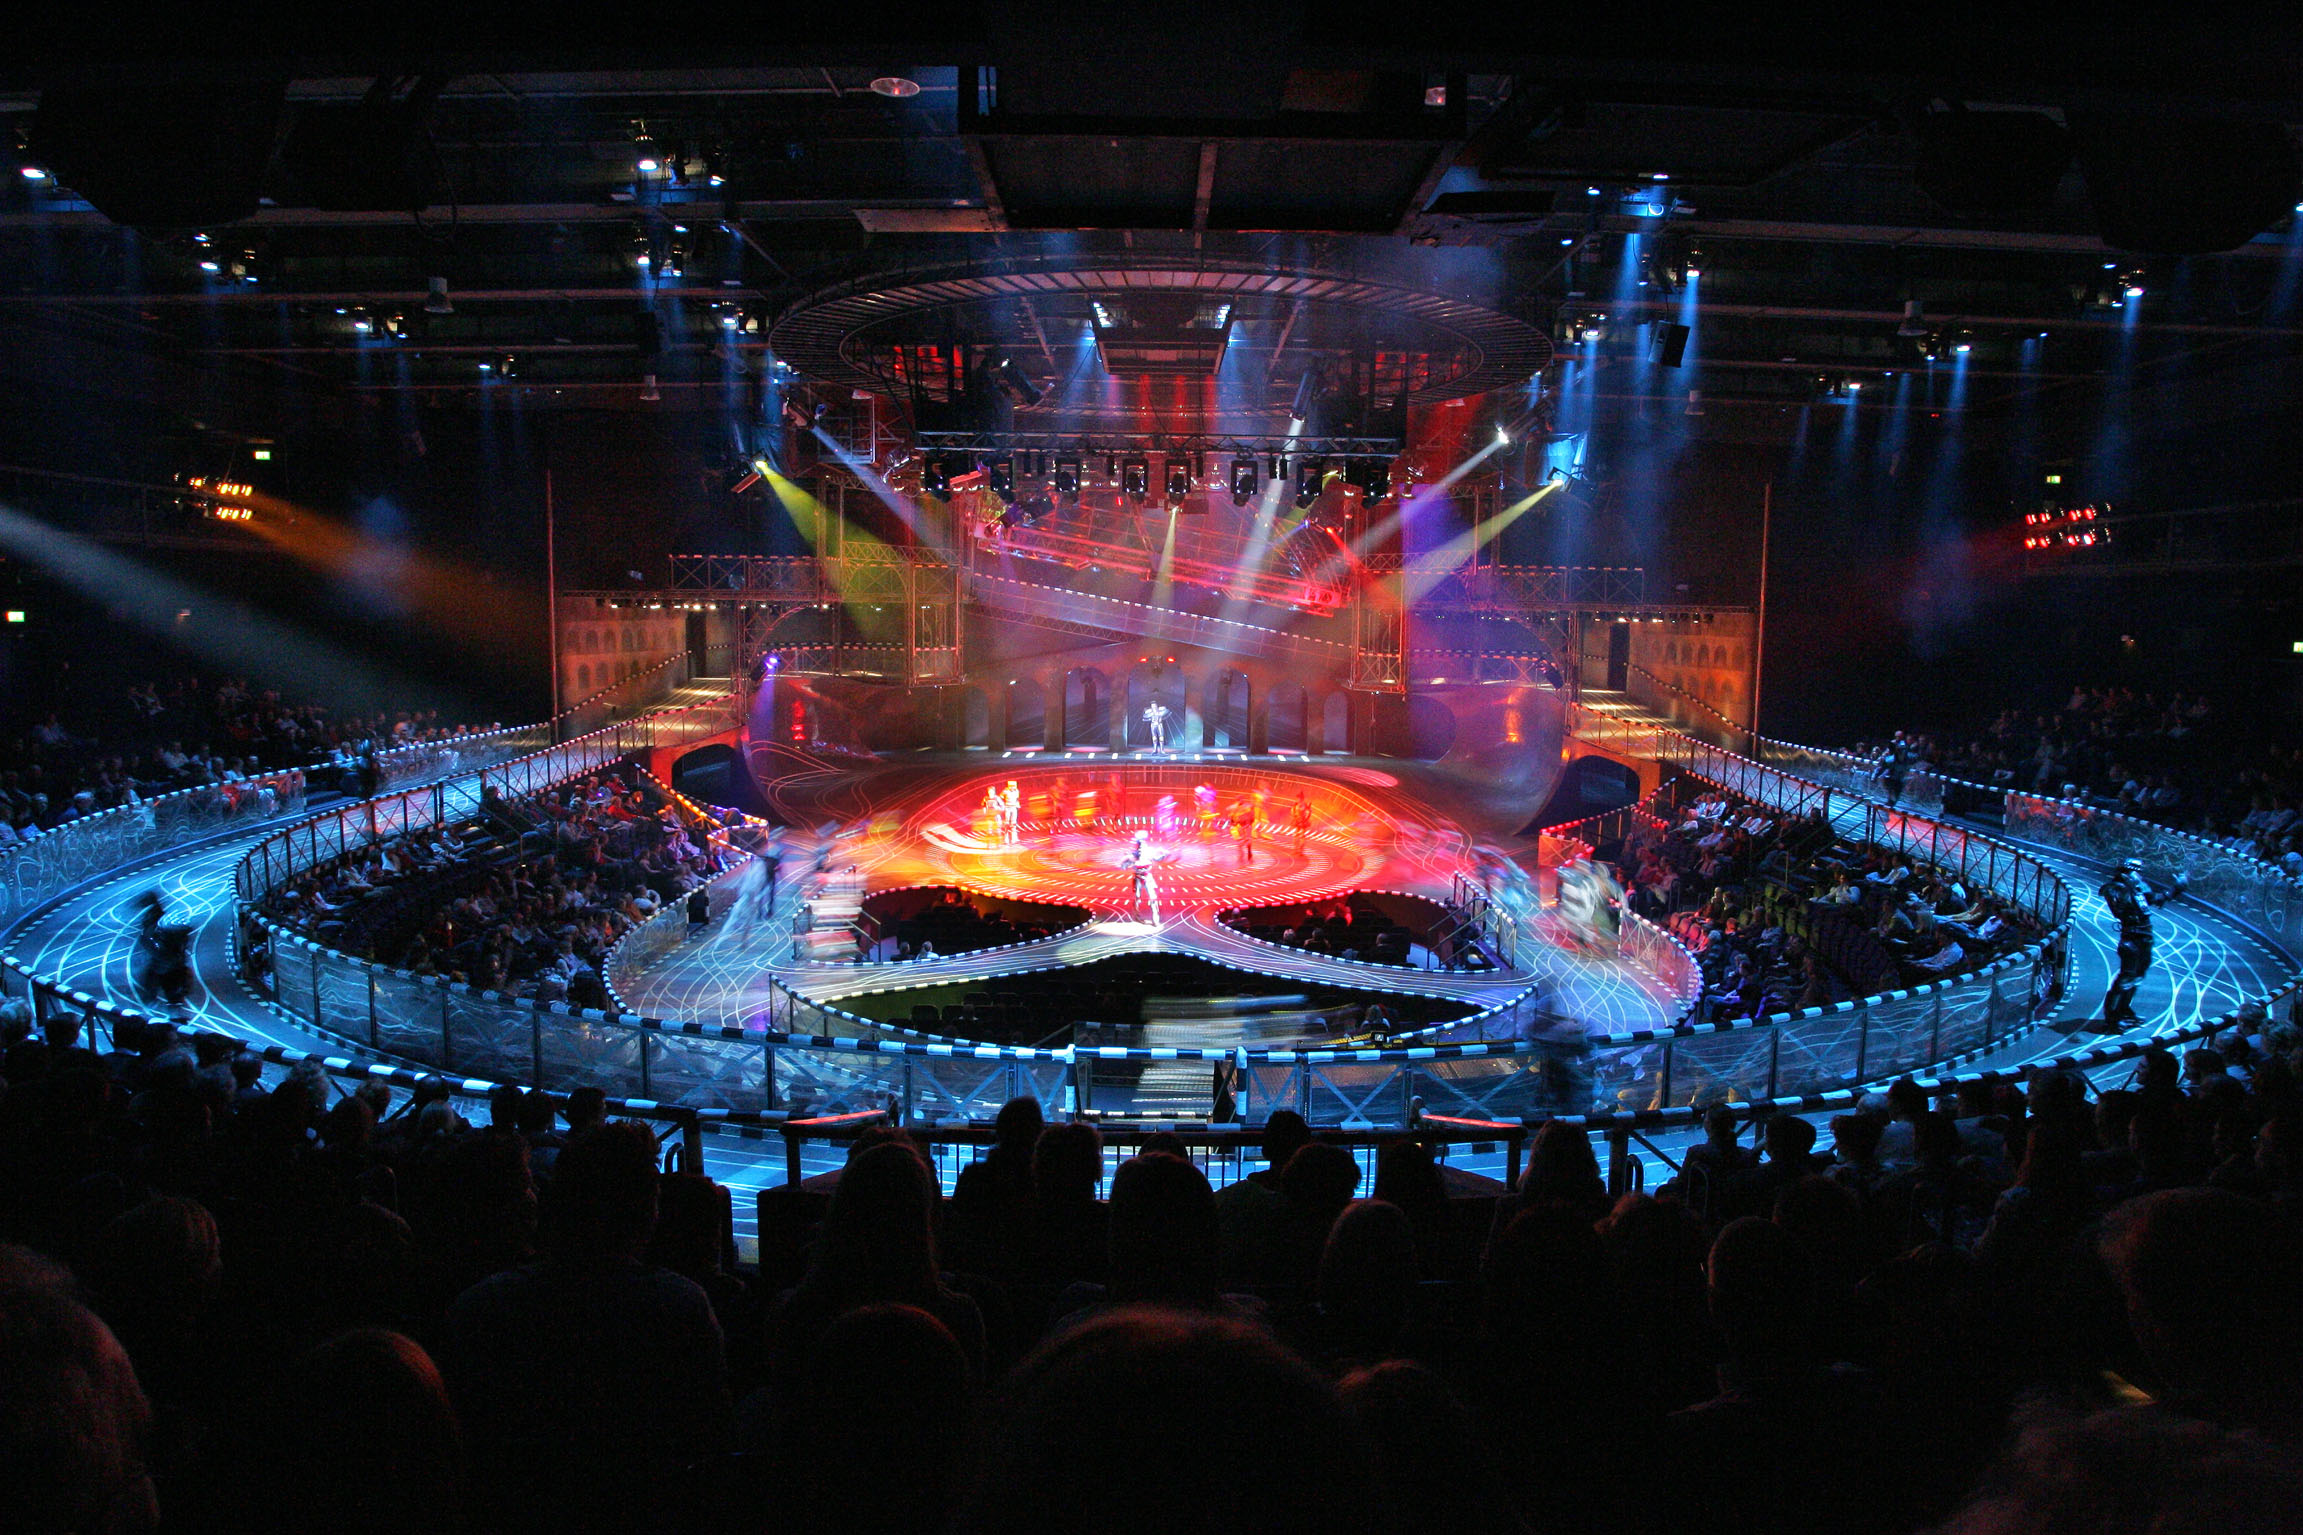 Bochum_2009_Starlight-Express-Theater-2